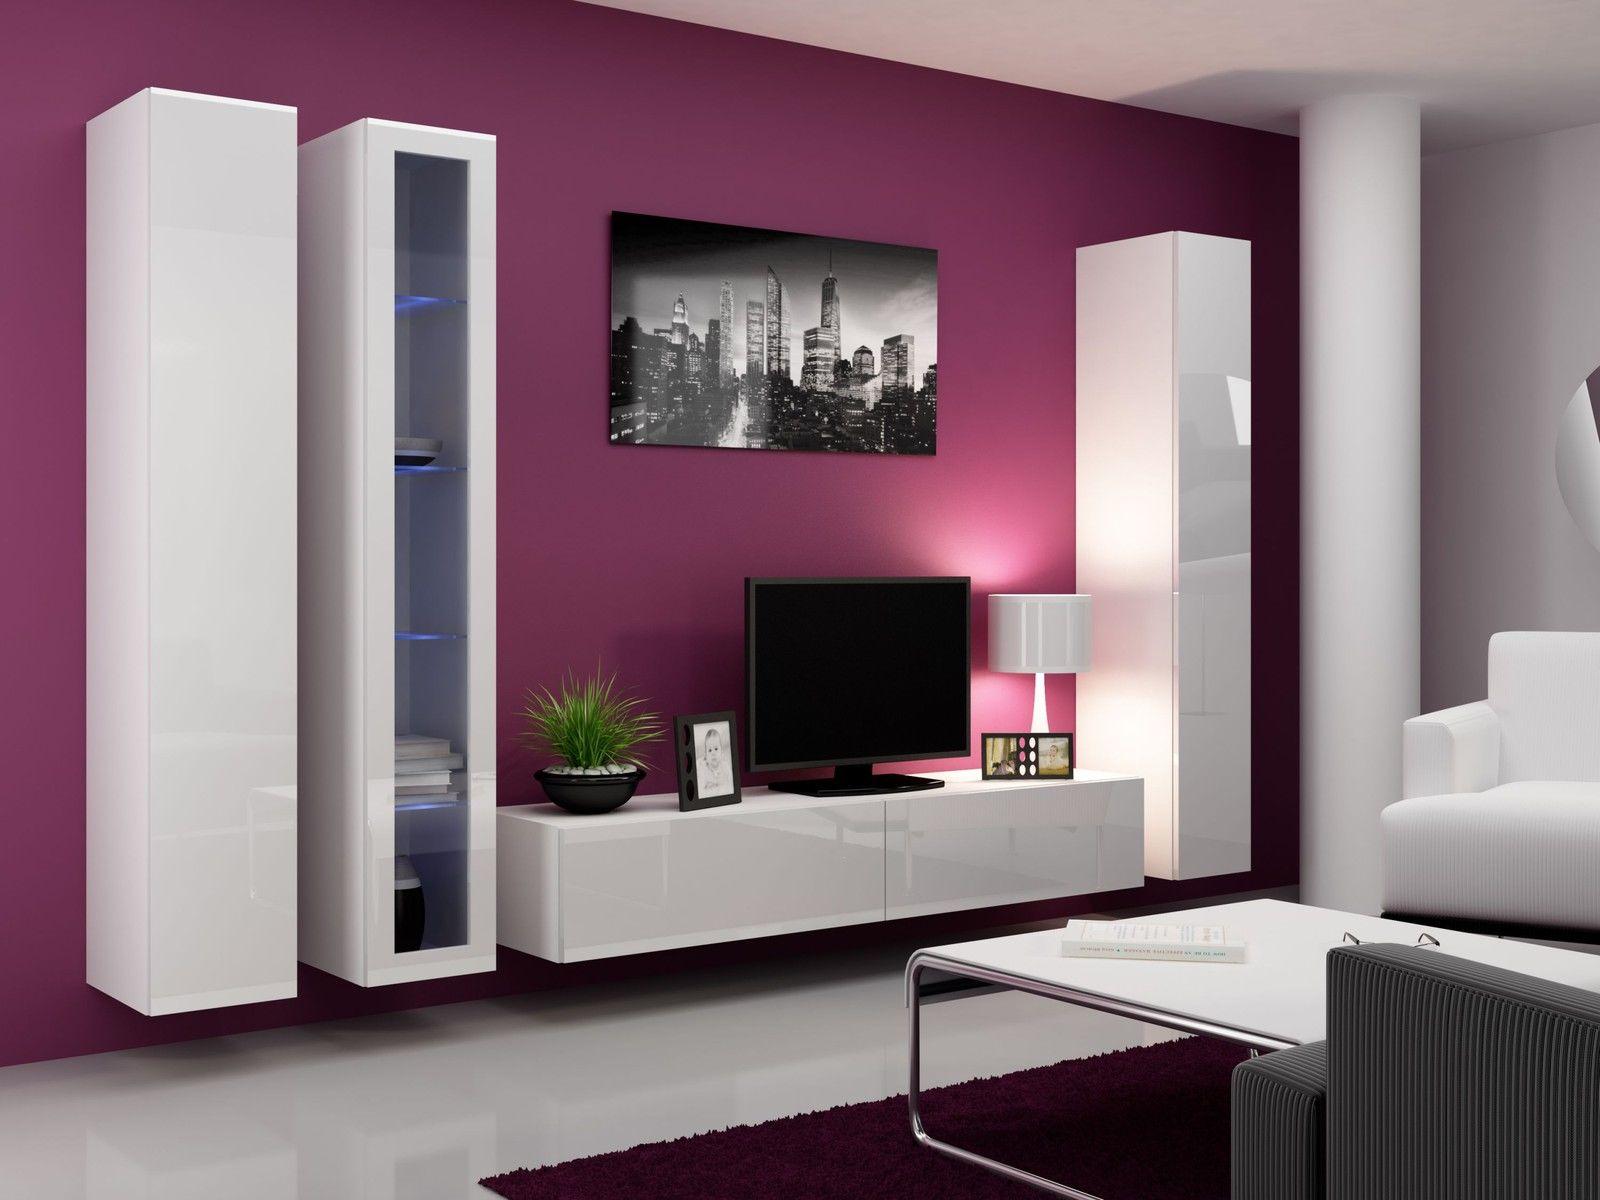 Ikea White Tv Stand Sweet Couple For Minimalism Homesfeed # Meuble Tv Living Salon Ikea